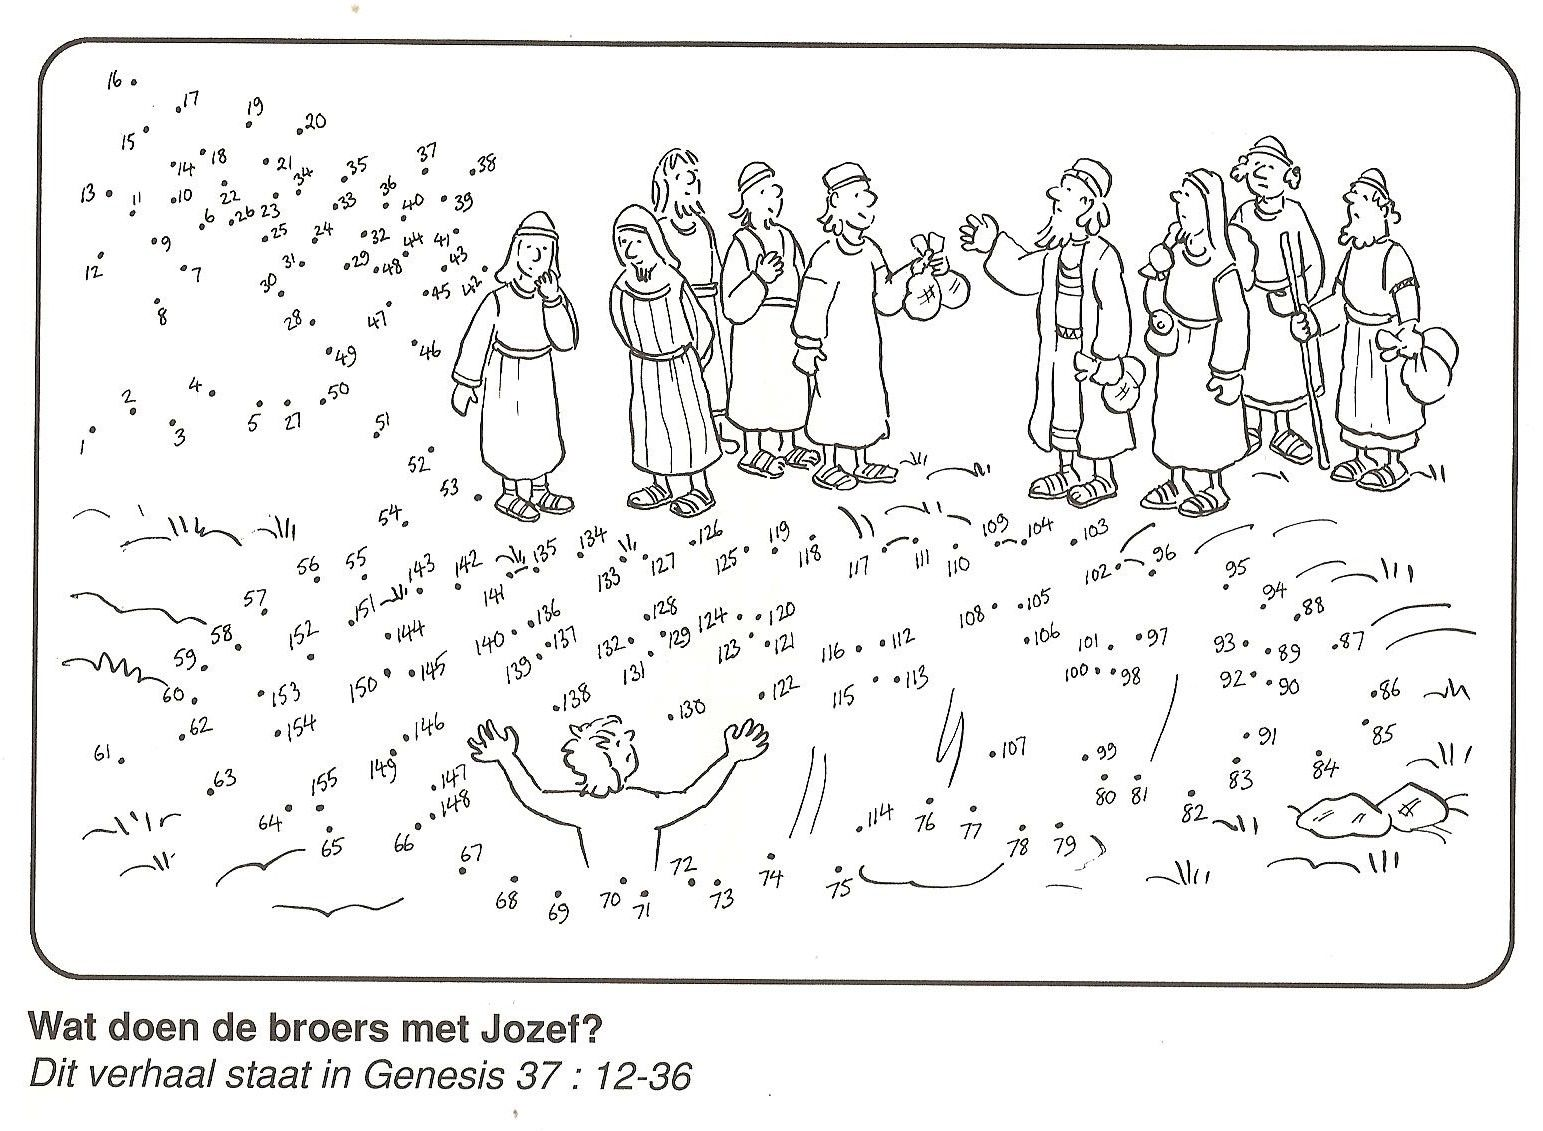 Joseph Thrown Into The Pit Genesis 37 Dot-to-dot Printable